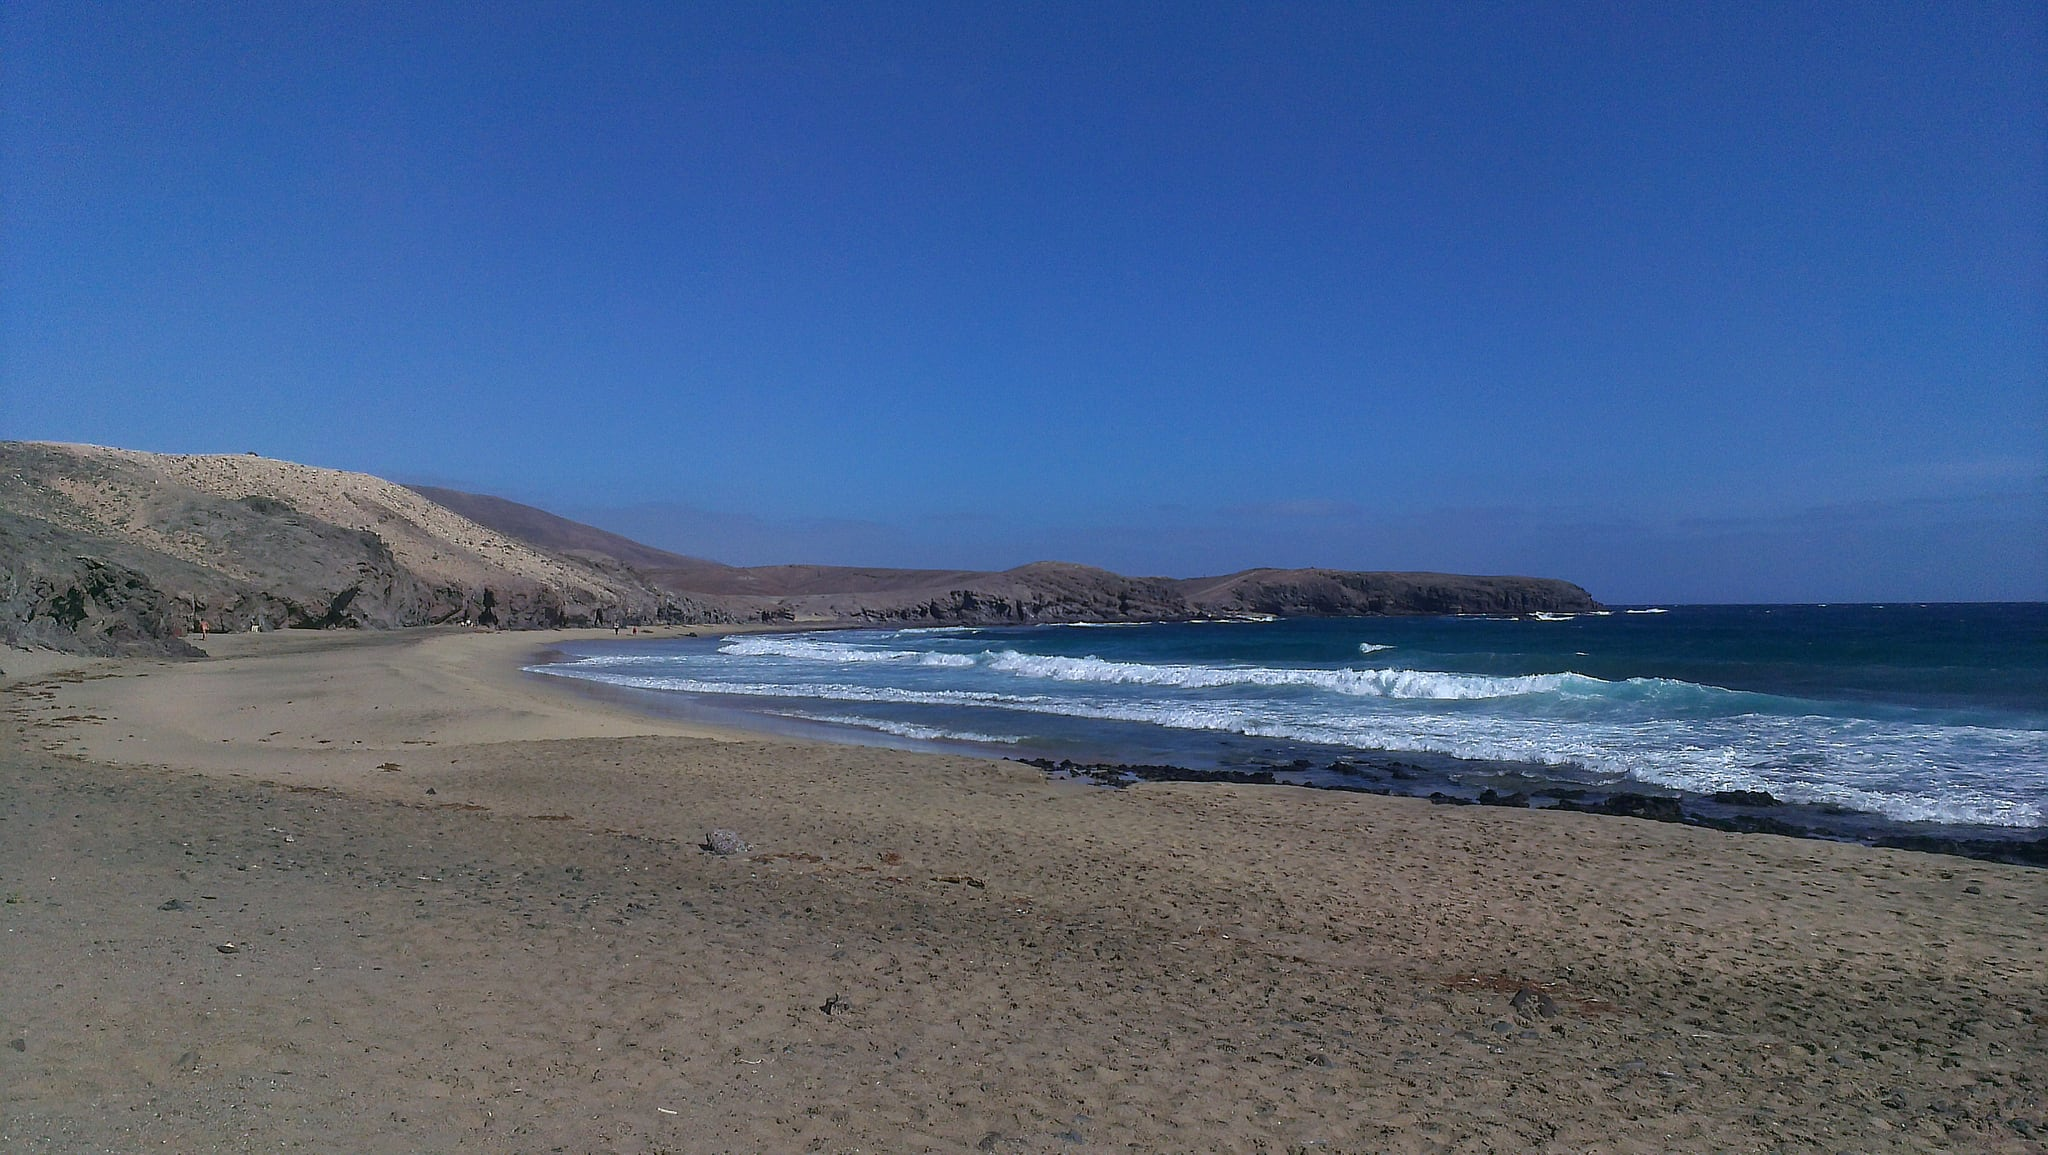 Afbeelding van Playa Caleta del Congrio.